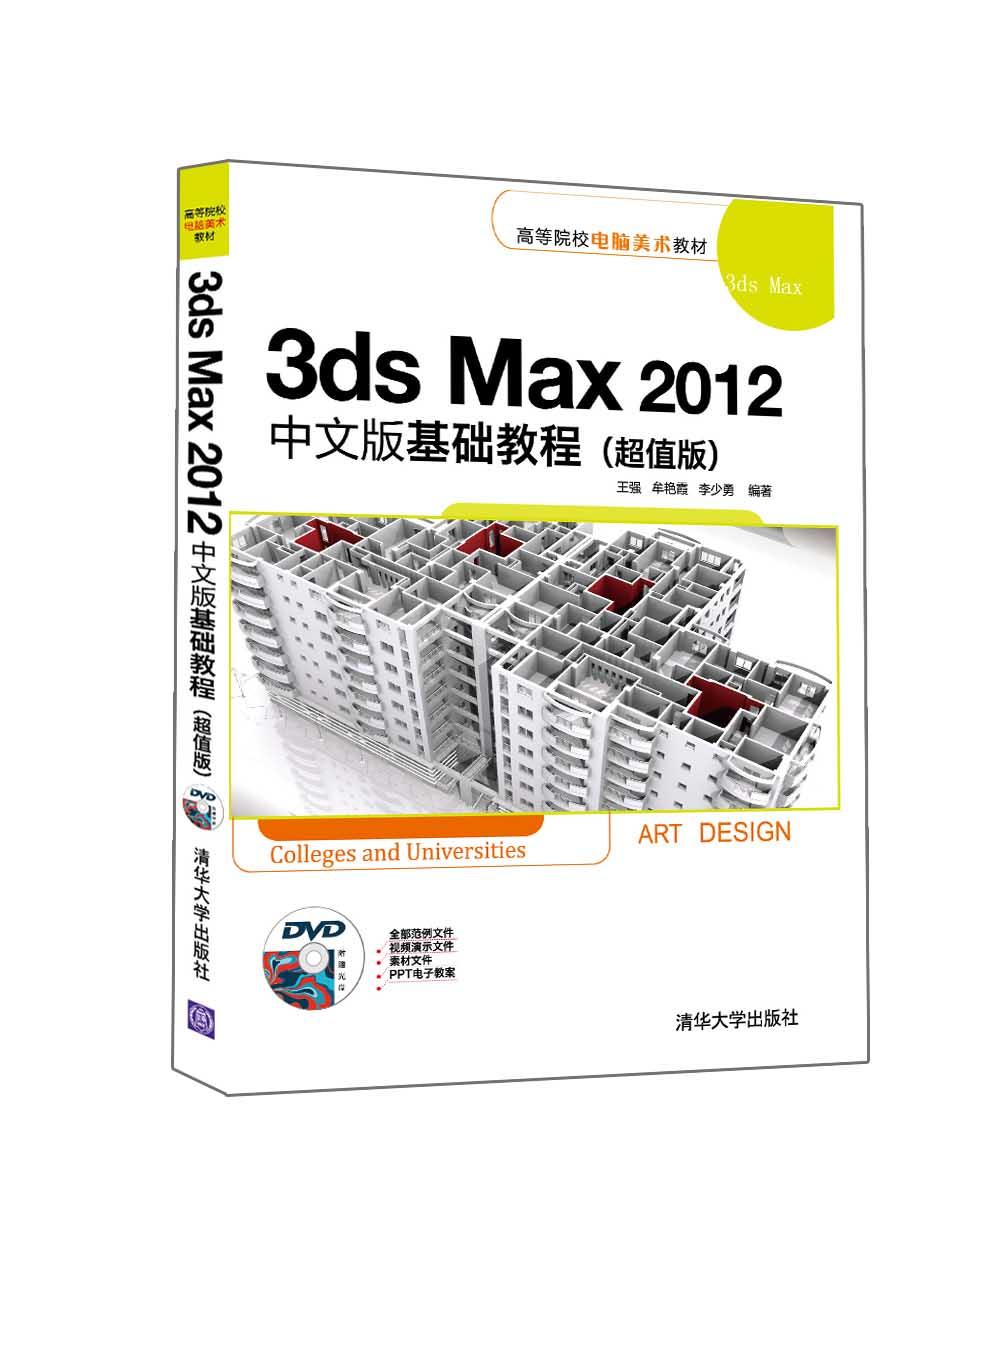 3ds max基础_清华大学出版社-图书详情-《3ds Max 2012中文版基础教程(超值版)》